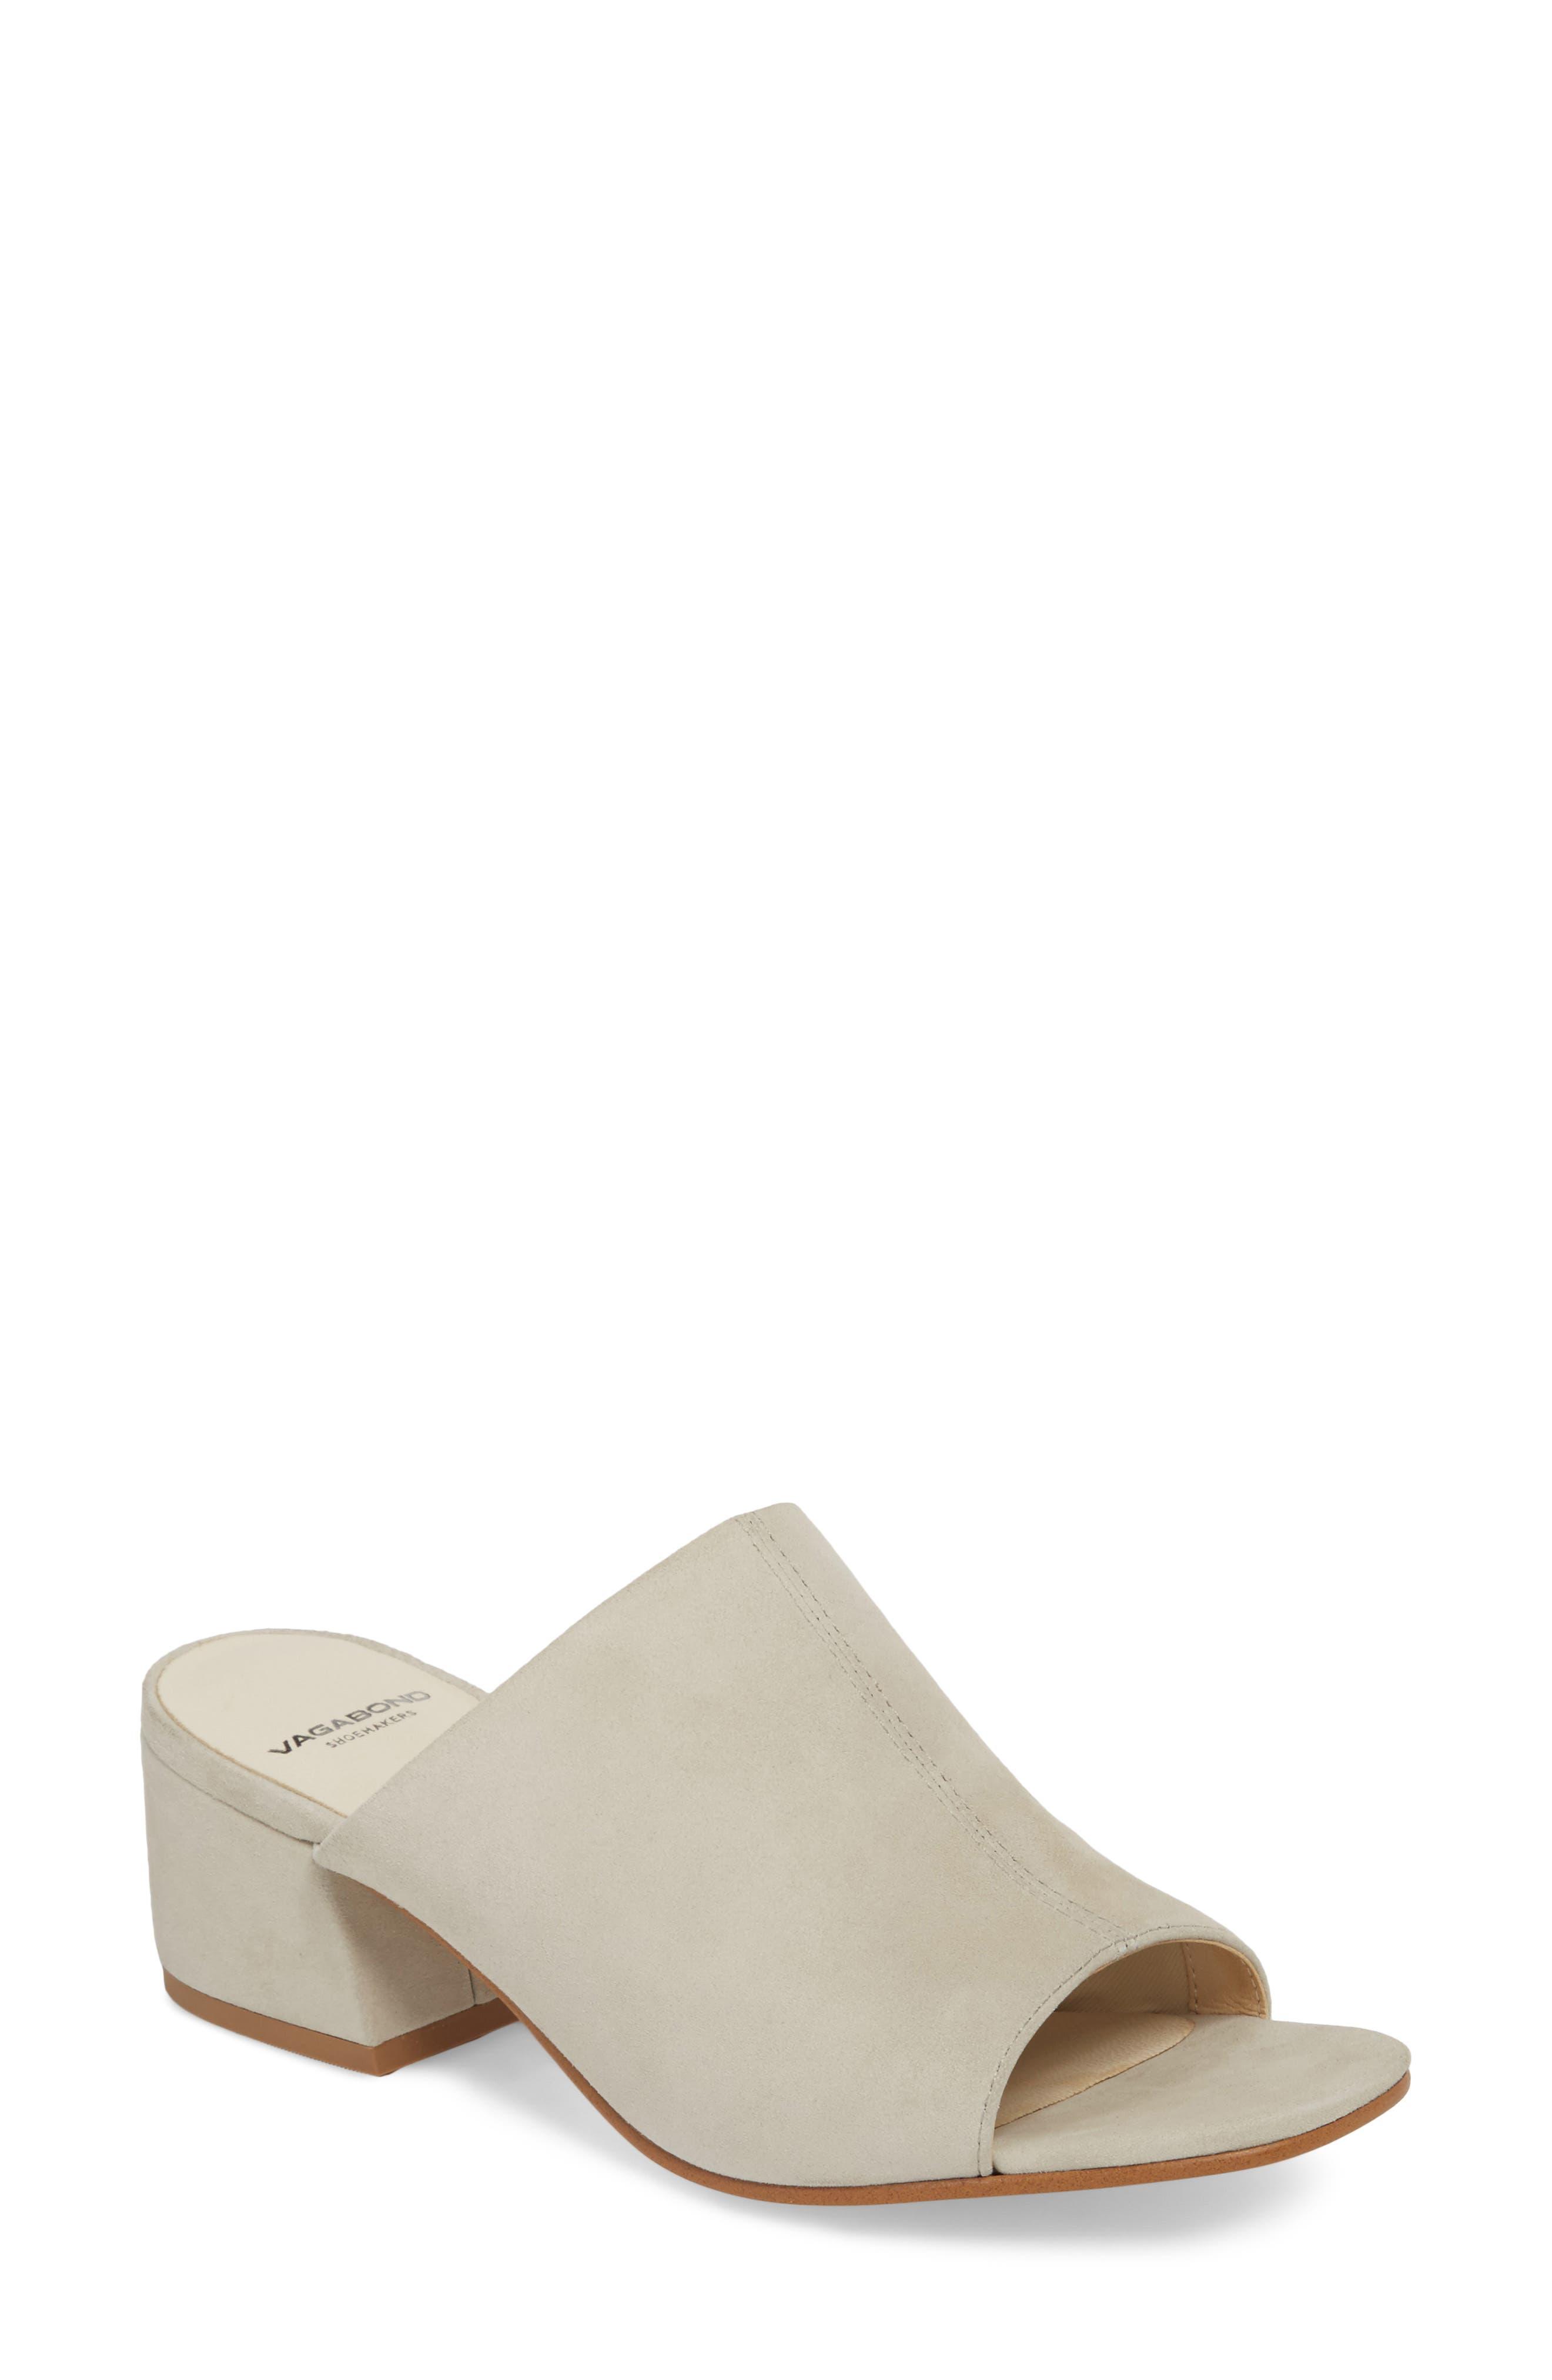 Vagabond Shoemakers Saide Slide Sandal